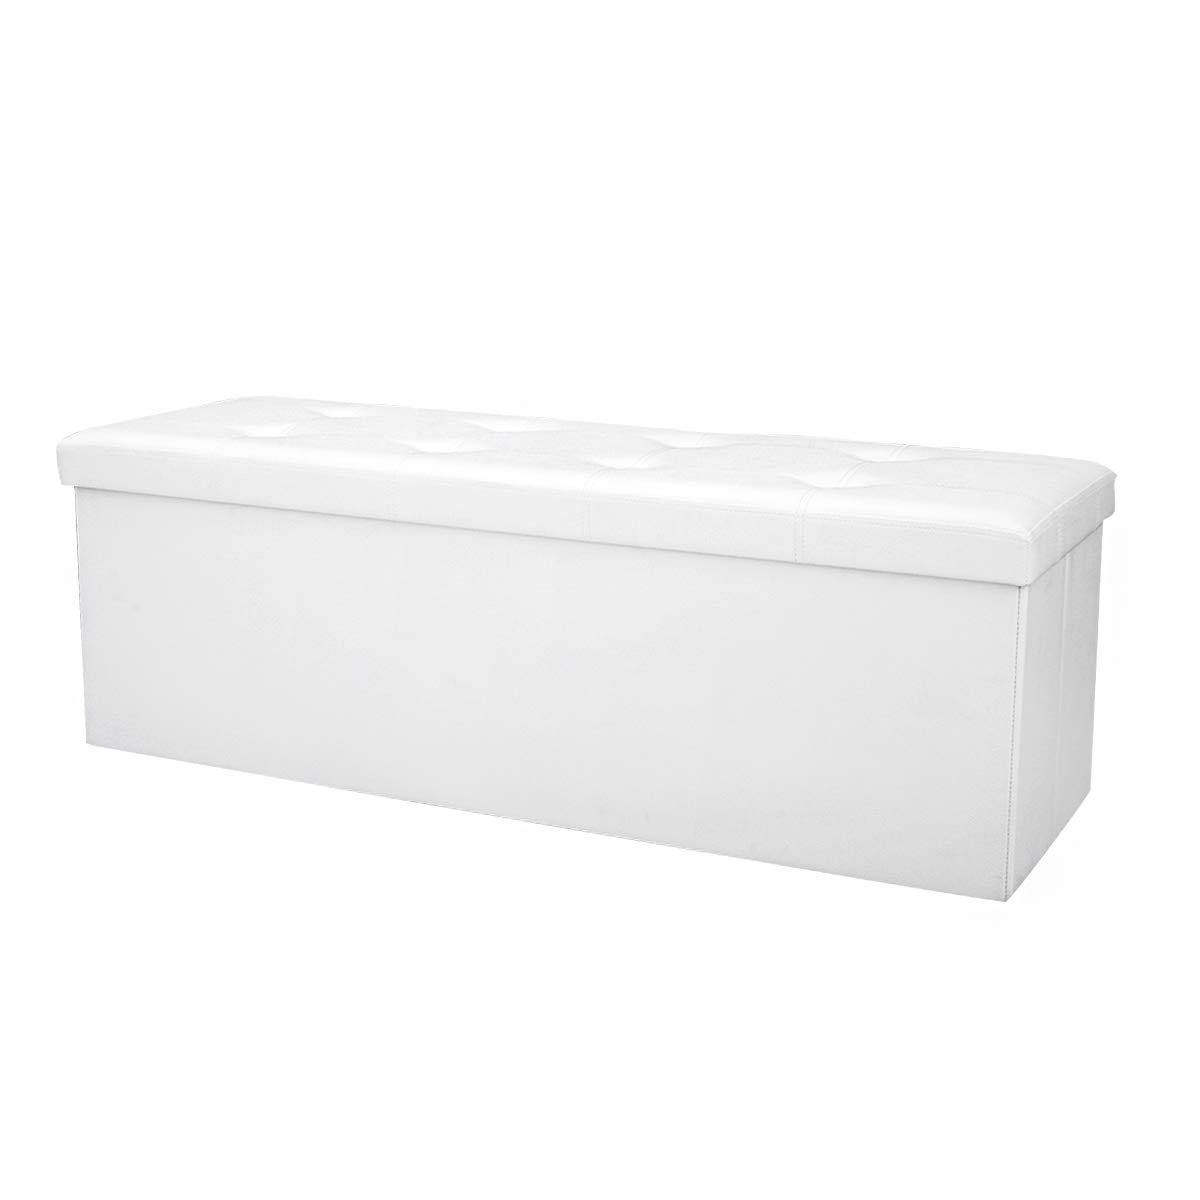 Braun Sitzkasten Polsterhocker Truhe COSTWAY Sitzbank bis 300kg belastbar Sitztruhe PVC-Leder Sitzbox Sitzw/ürfel Bank faltbar Aufbewahrungsbox 114 x 38 x 38cm